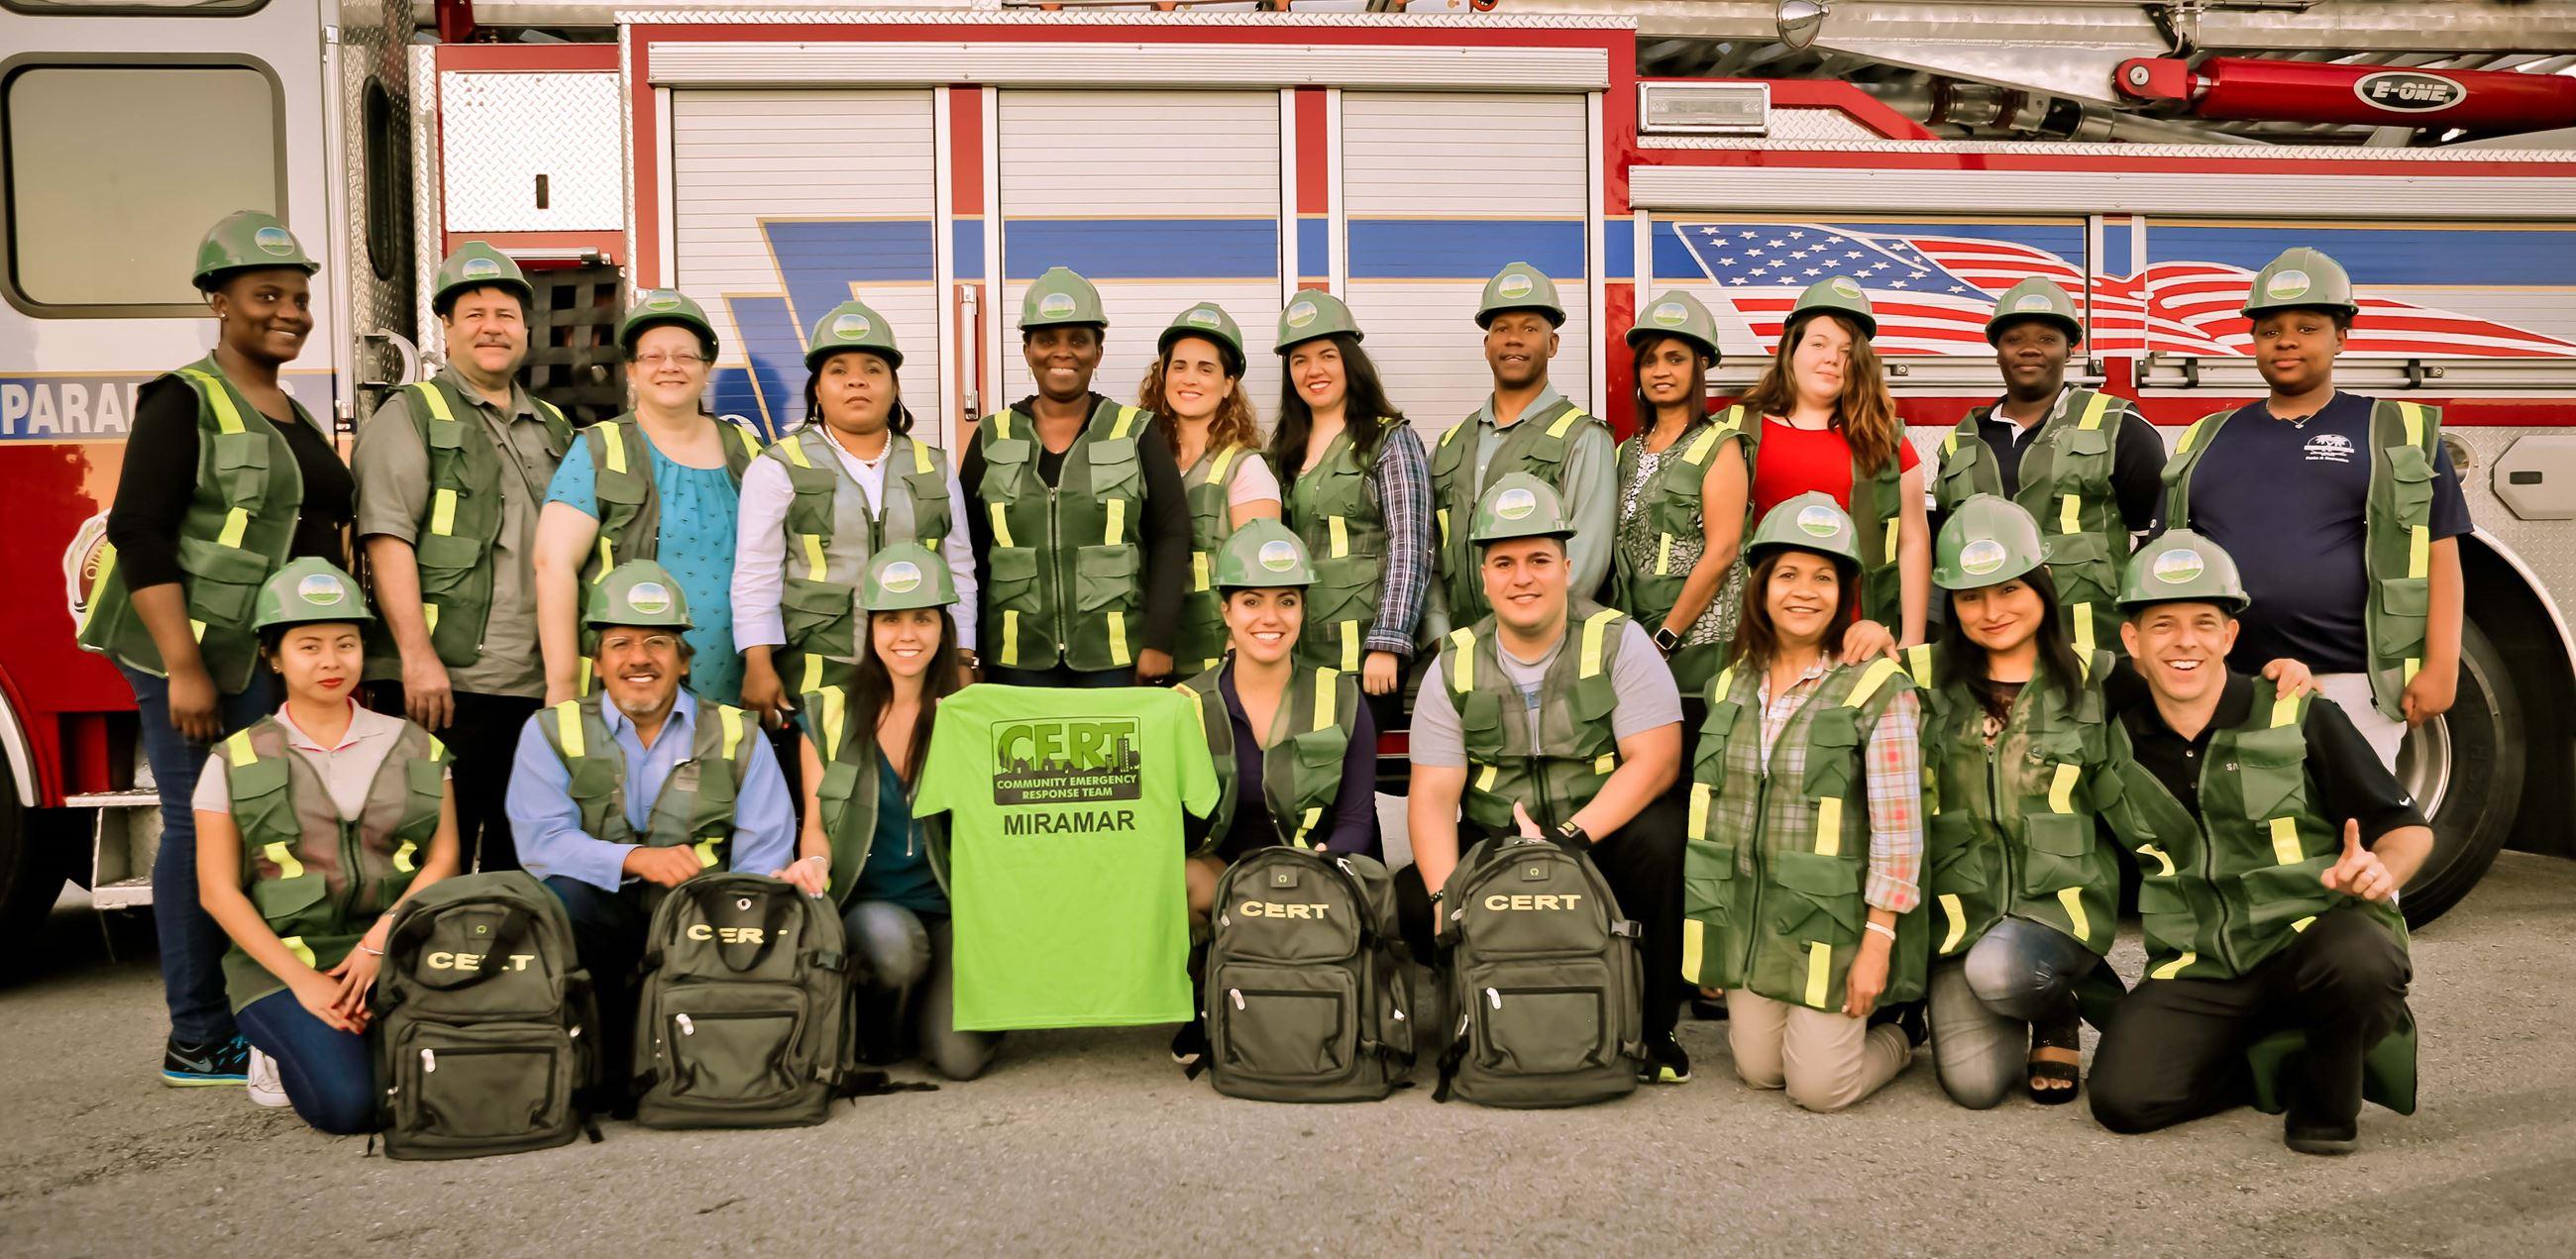 Community Emergency Response Team | Miramar, FL - Official